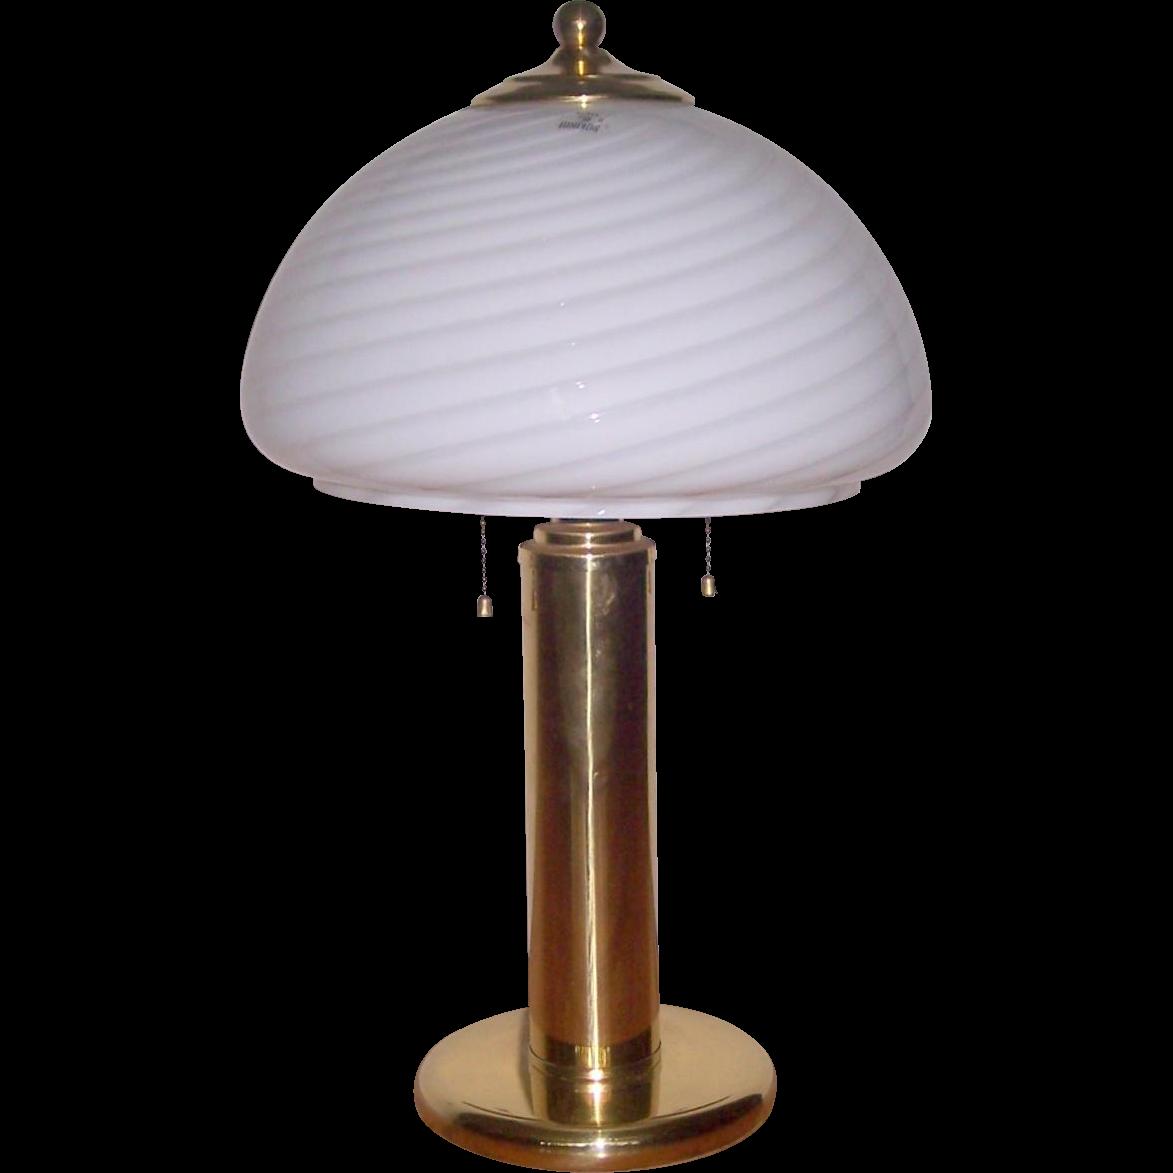 vetri murano venini glass table lamp from modseller on. Black Bedroom Furniture Sets. Home Design Ideas